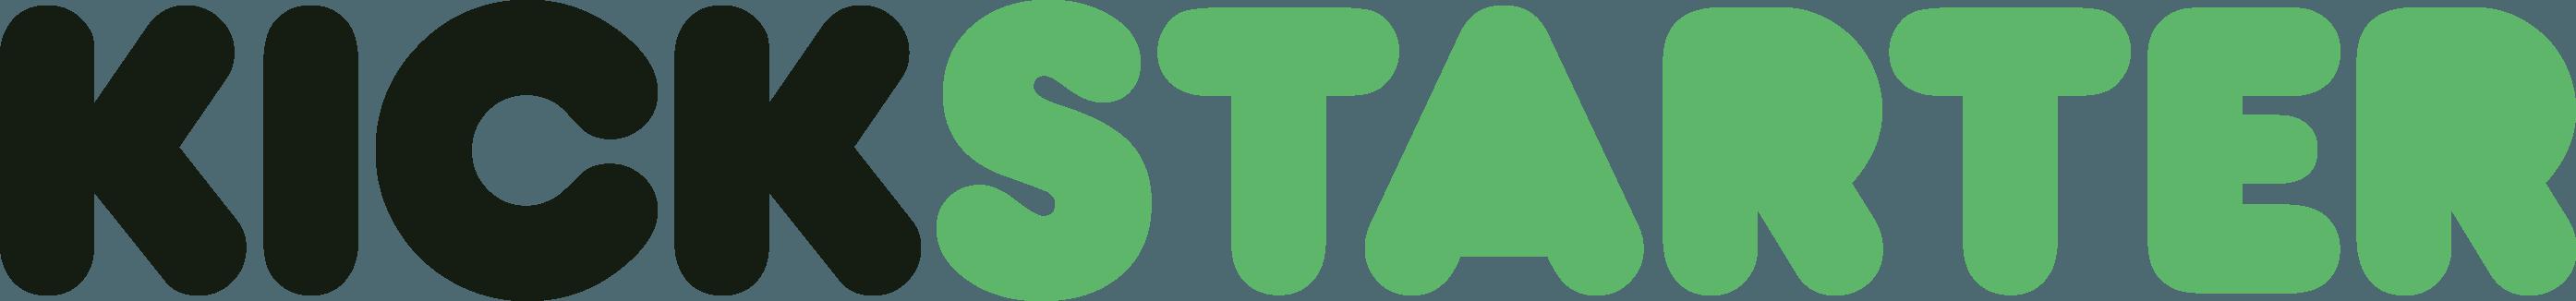 Kickstarter Logo [PDF] png